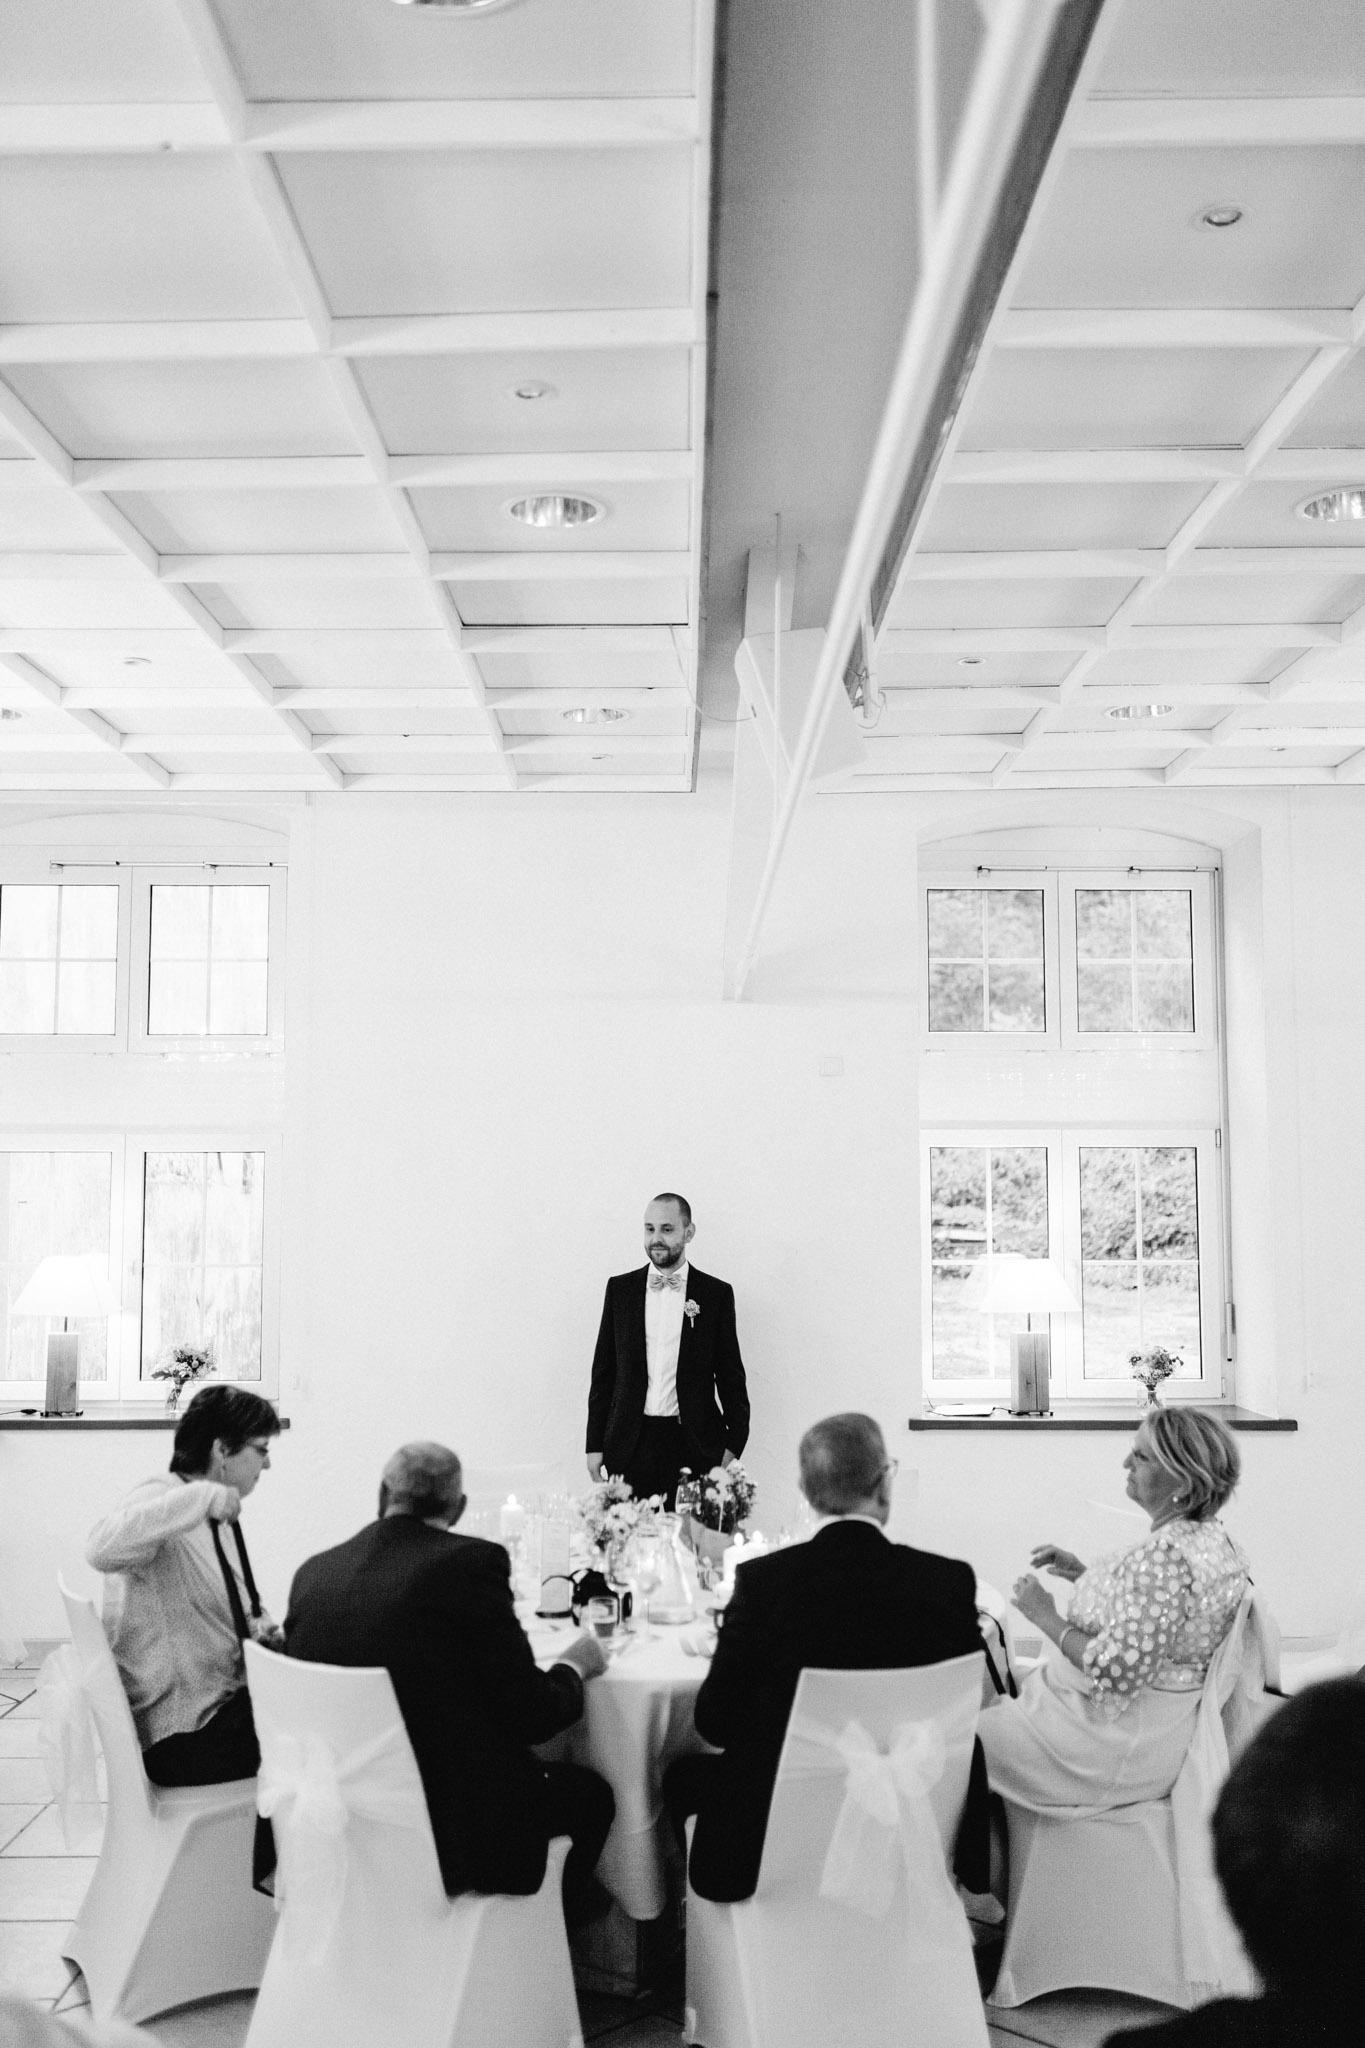 Lilienhof-Freiburg-Hochzeit-Pia-Anna-Christian-Wedding-Photography-FS-111.jpg